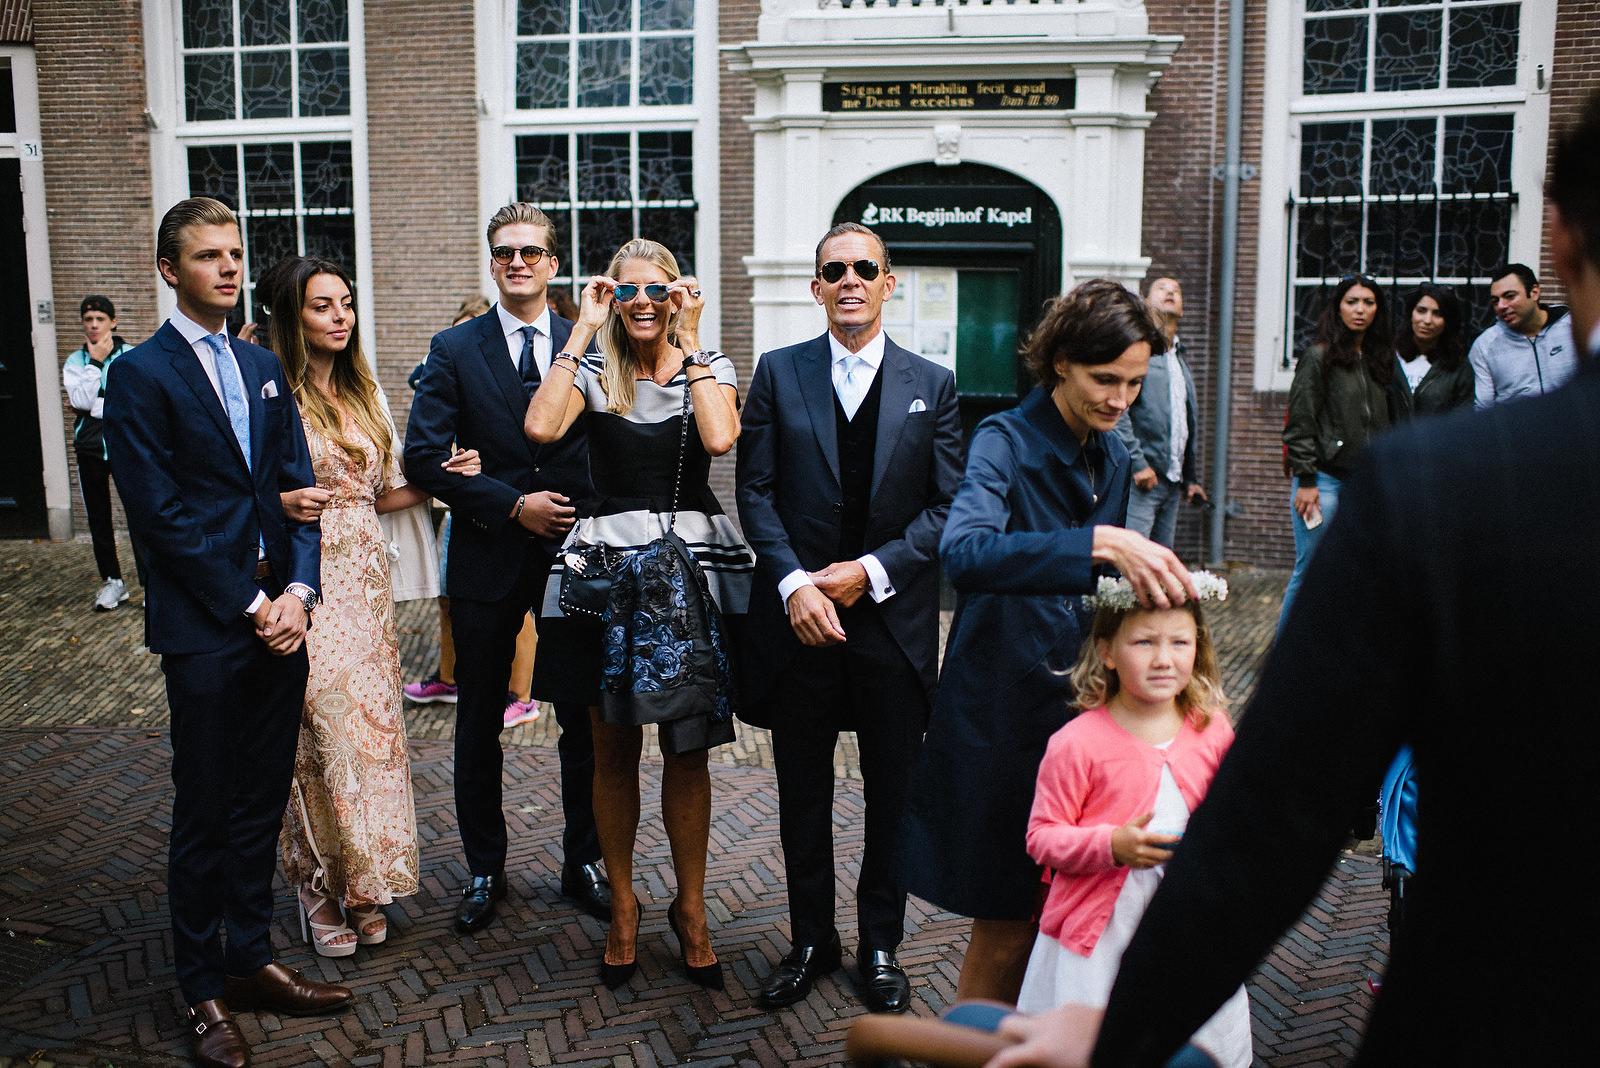 Fotograf Konstanz - Destination Wedding Photographer Amsterdam 028 - Destination Wedding Amsterdam  - 141 -